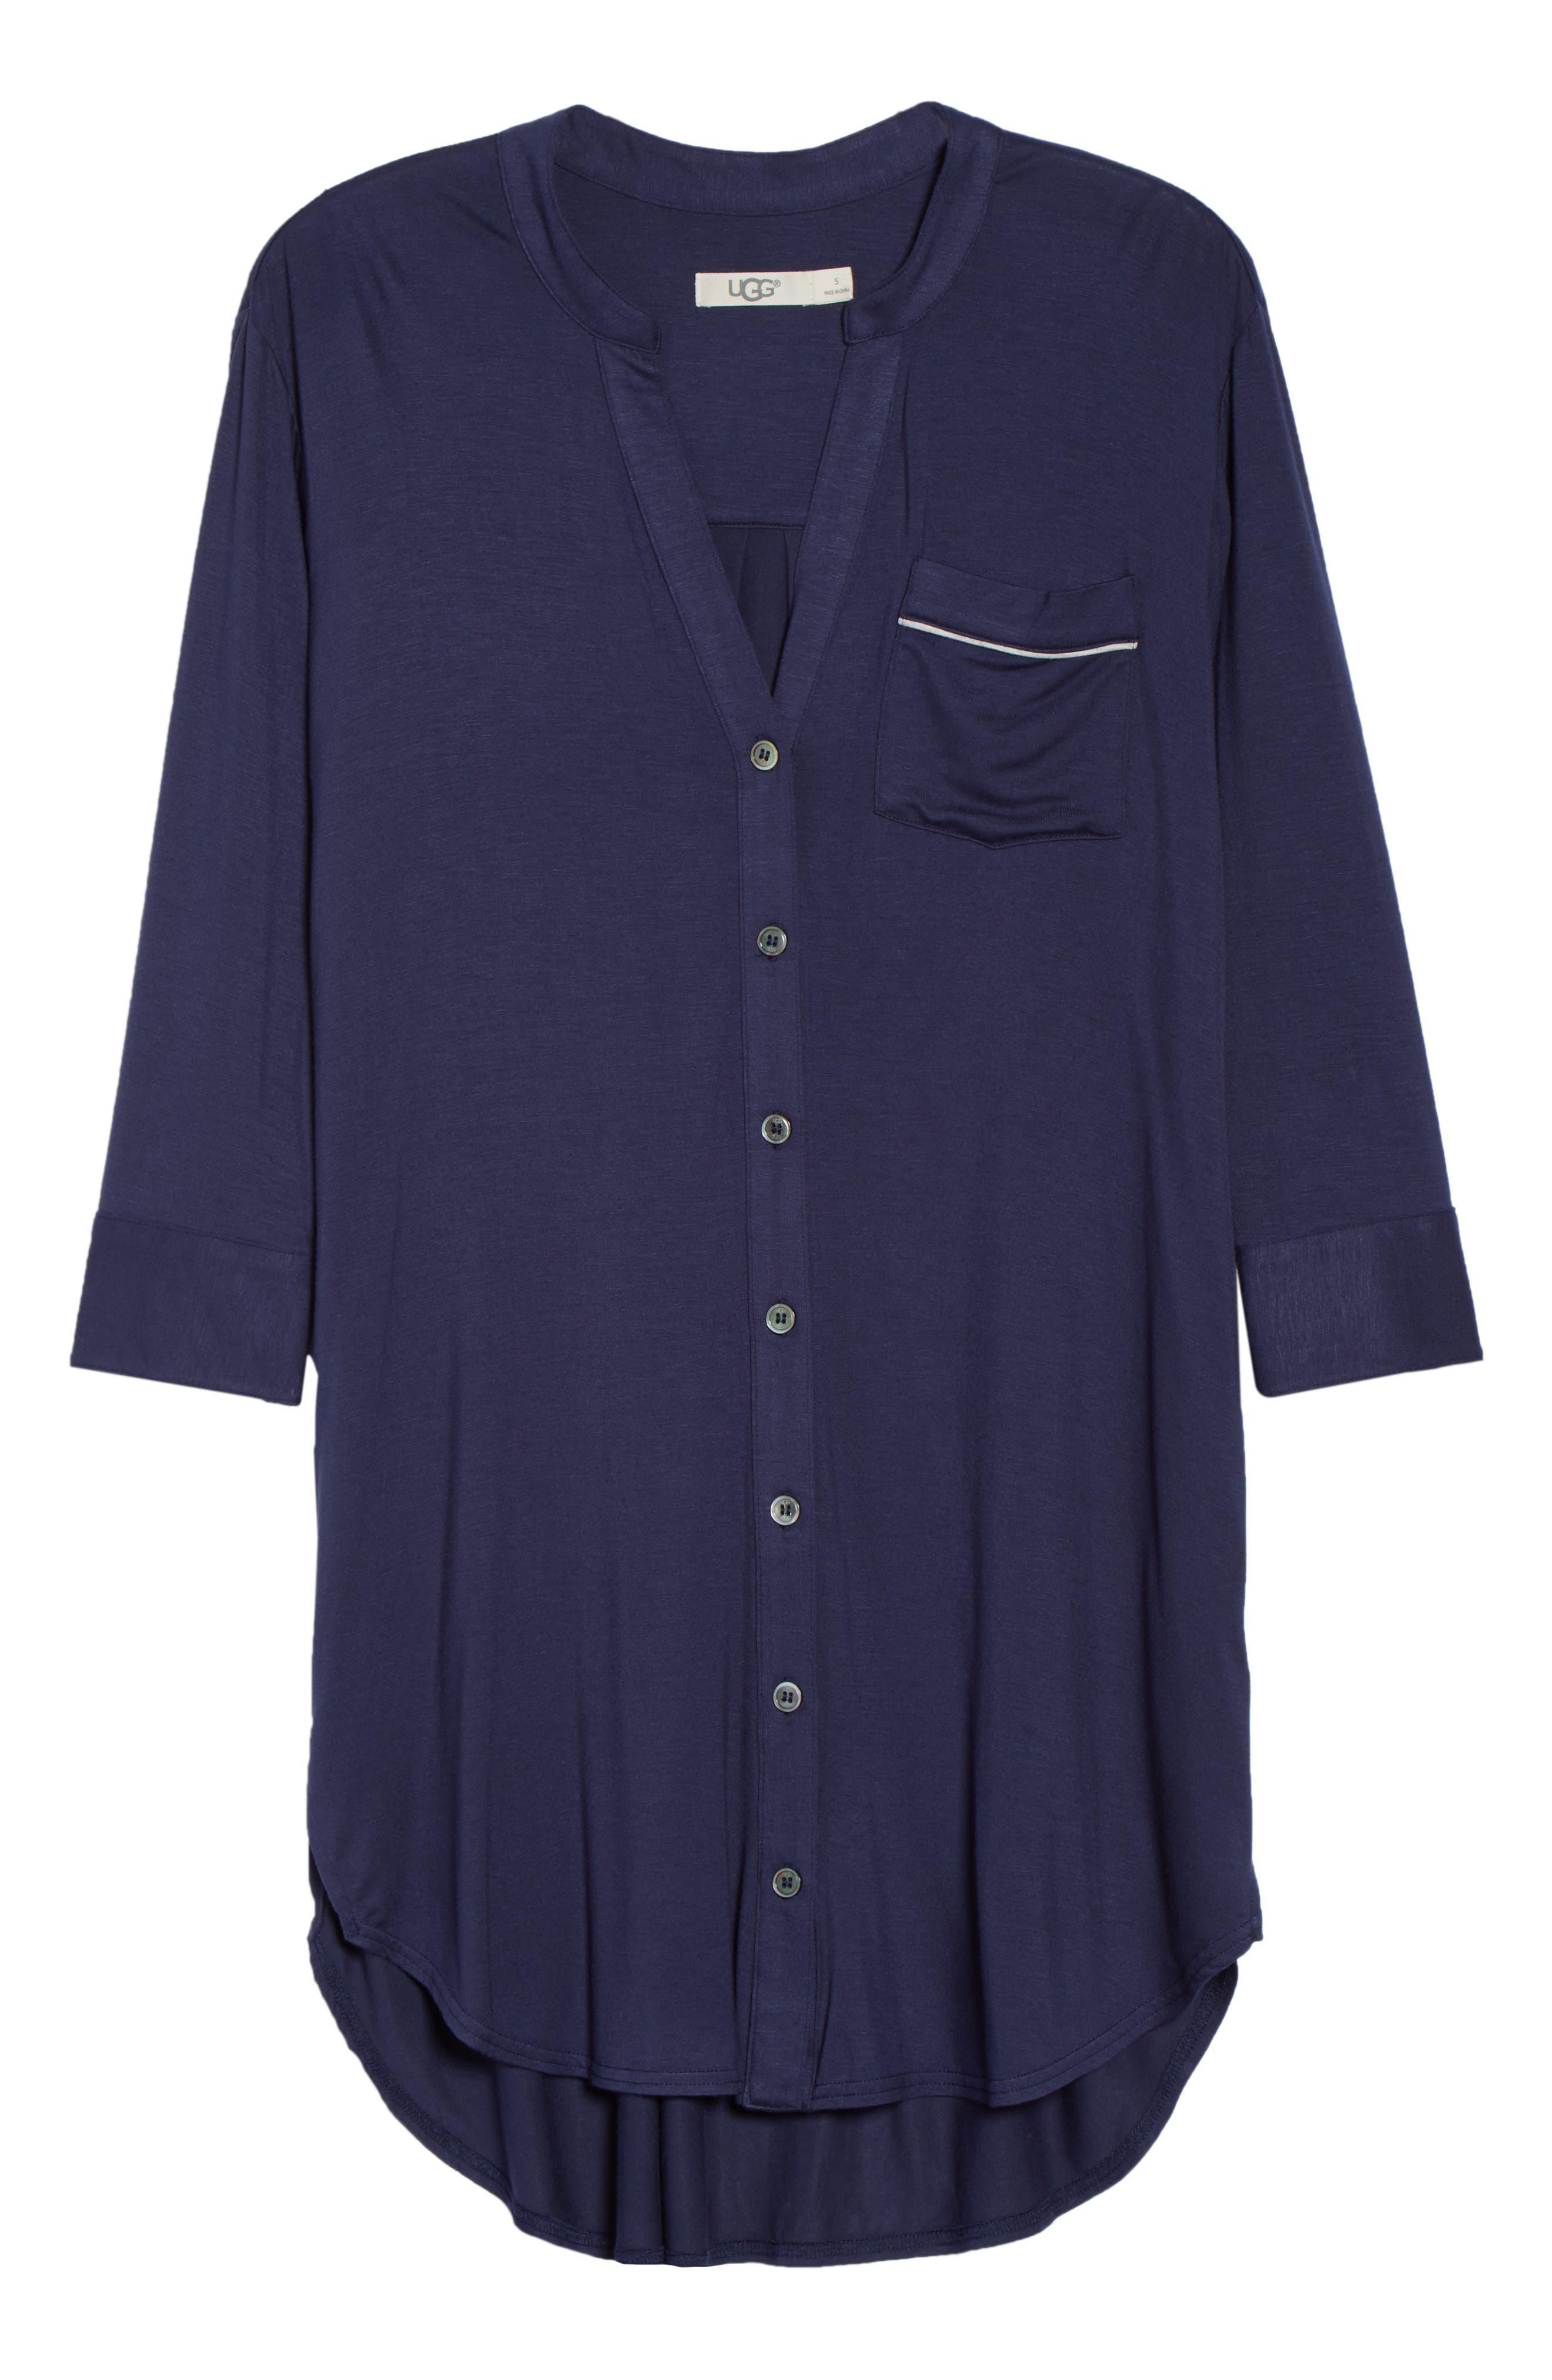 Vivian Sleep Shirt,                             Alternate thumbnail 6, color,                             NAVY